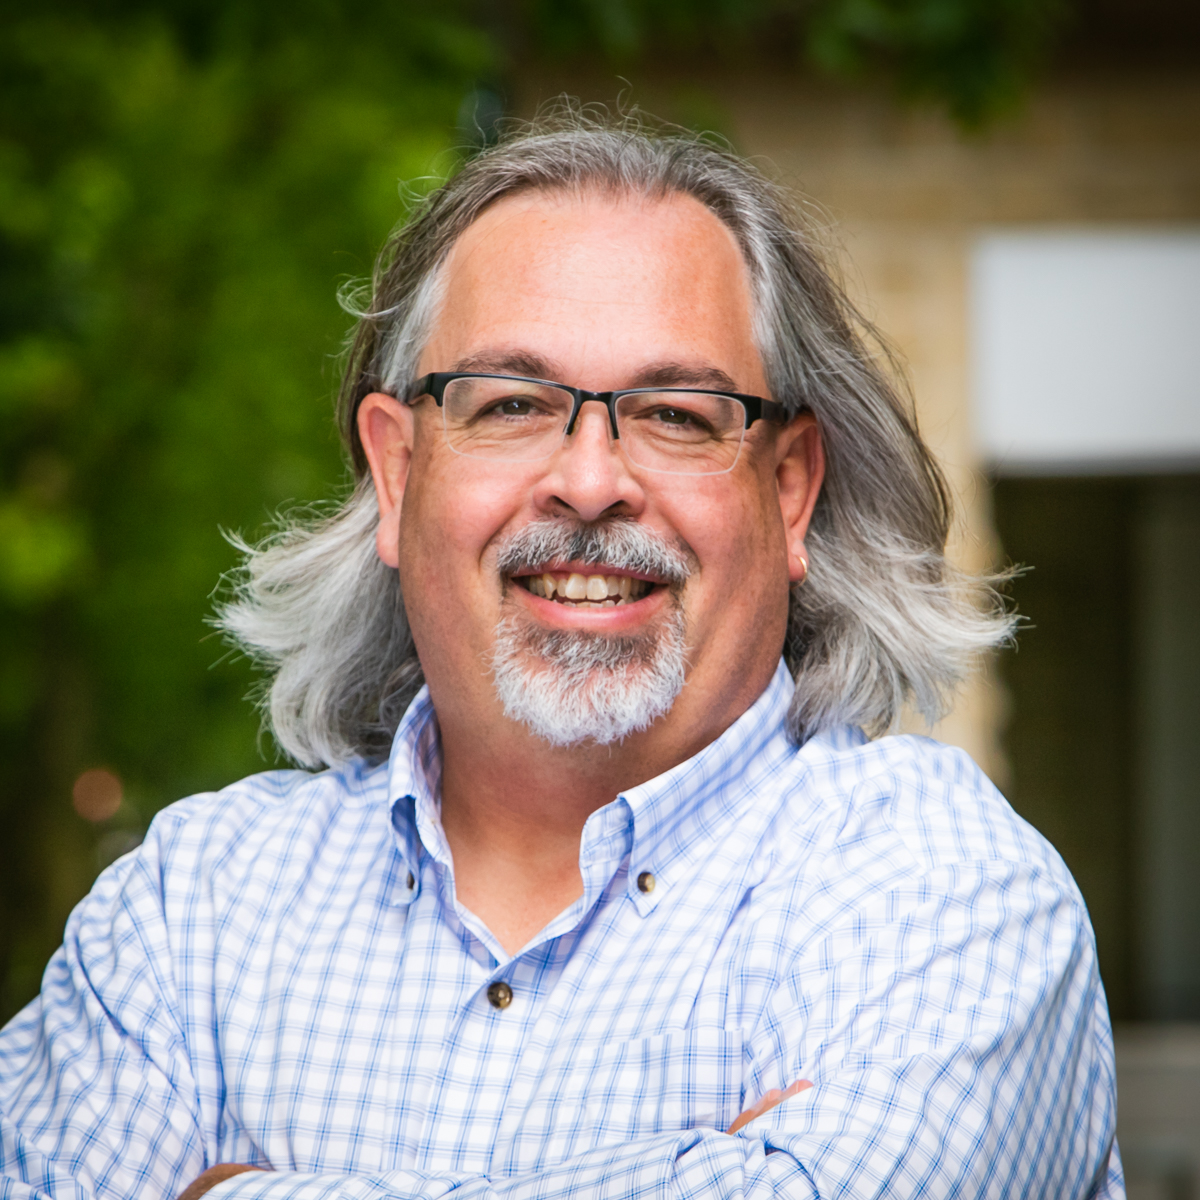 Glen Pyle, University of Guelph Professor of Biomedical Sciences & Biophysics